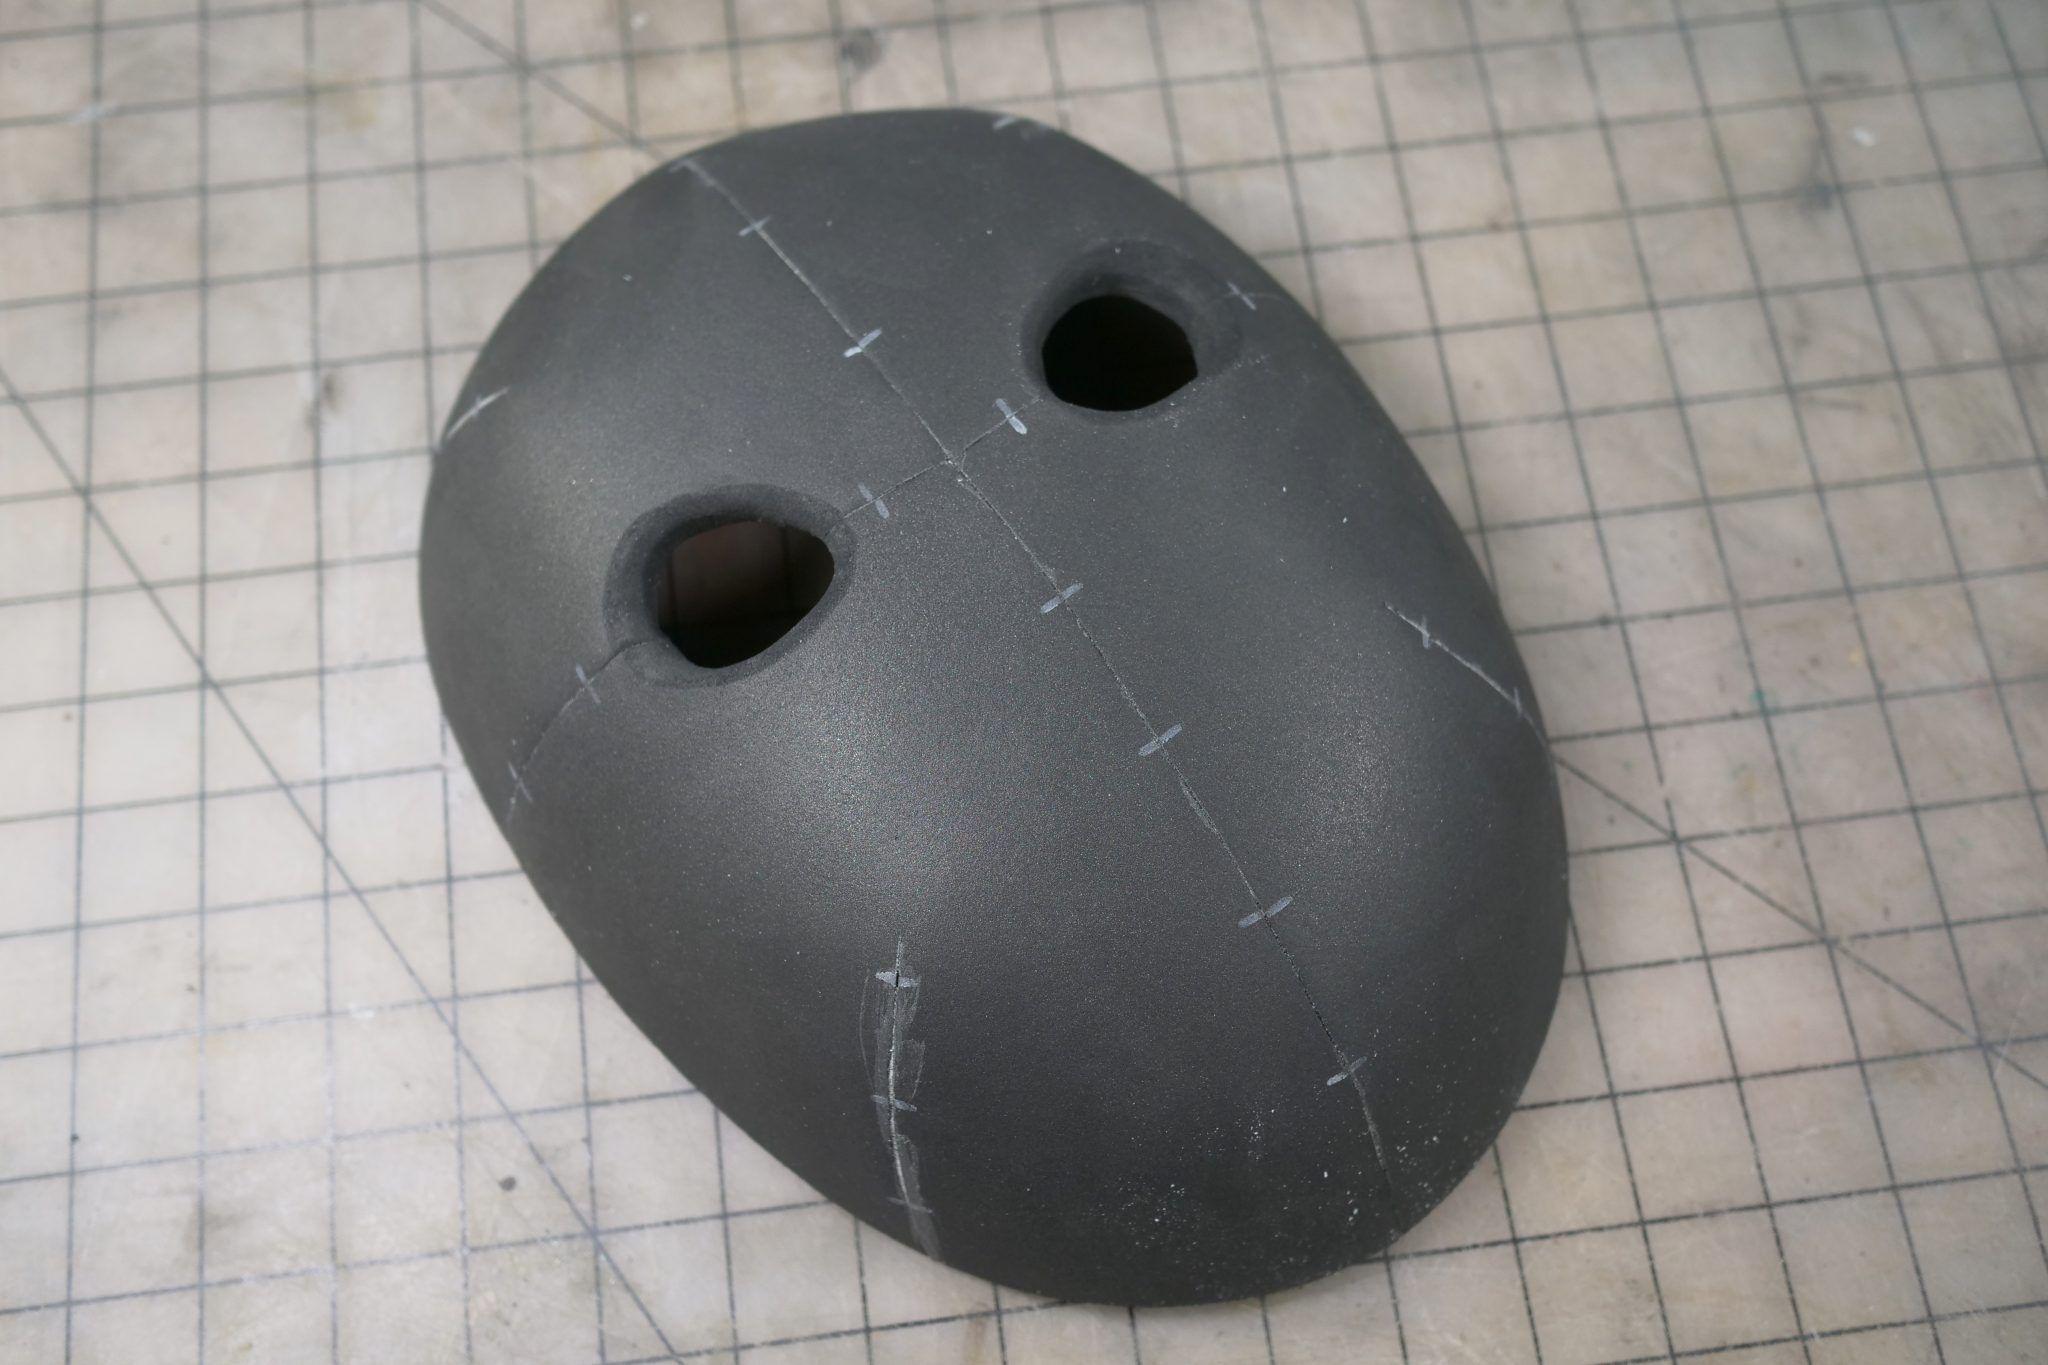 Far Cry New Dawn Making A Judge Mask With Eva Foam Free Pattern Punished Props Academy Foam Props Eva Foam Armor Foam Crafts